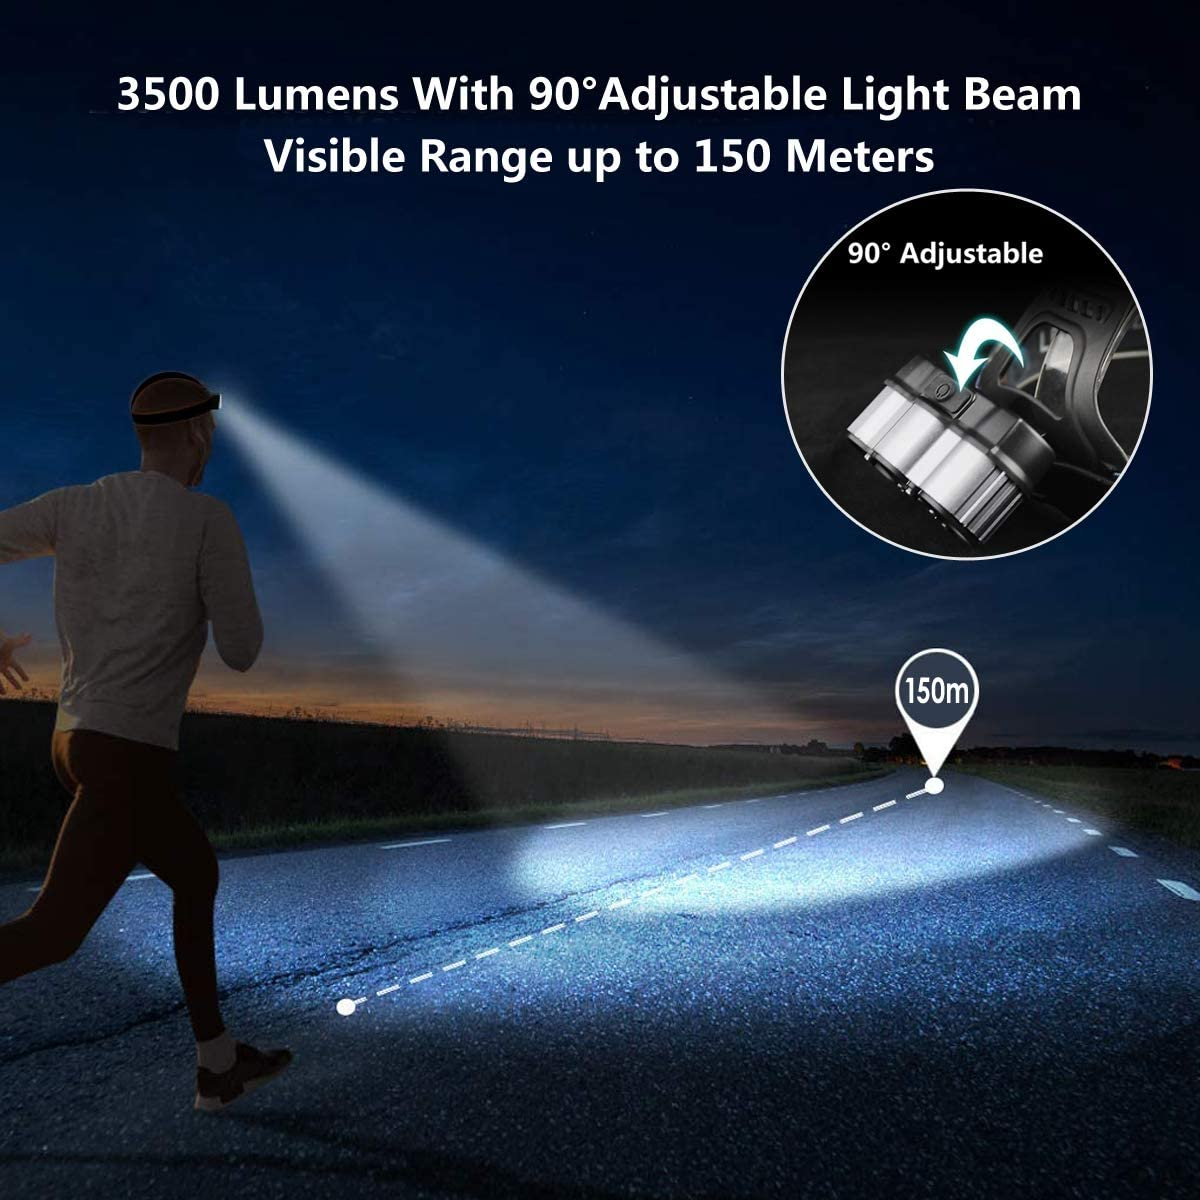 Waterproof Headlight Lamp USB Rechargeable LED Headlamp//Head Torch Running Light